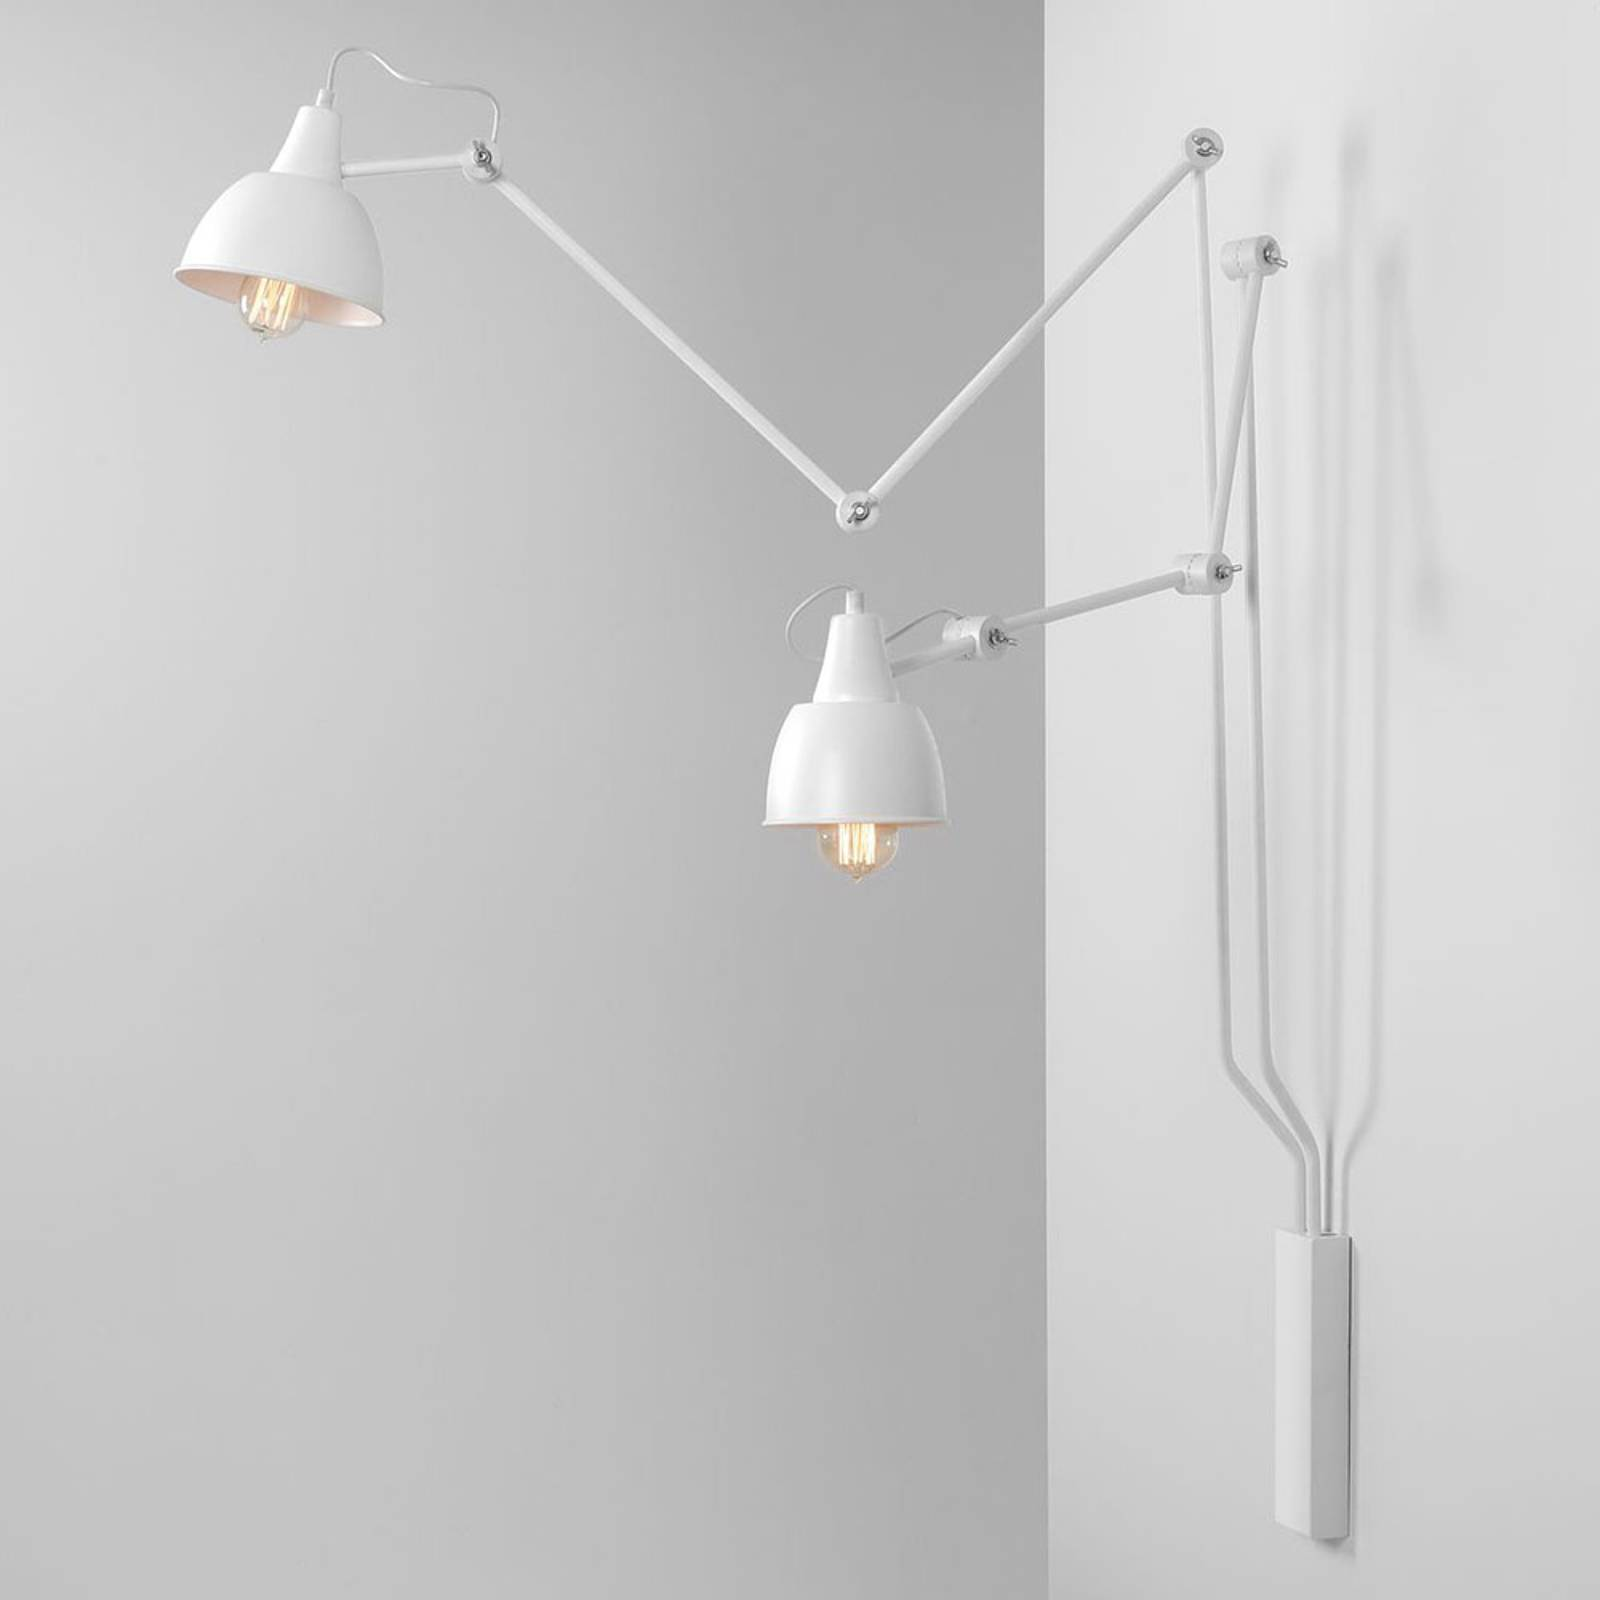 Wandlamp 814, verstelbaar, 2-lamps, wit